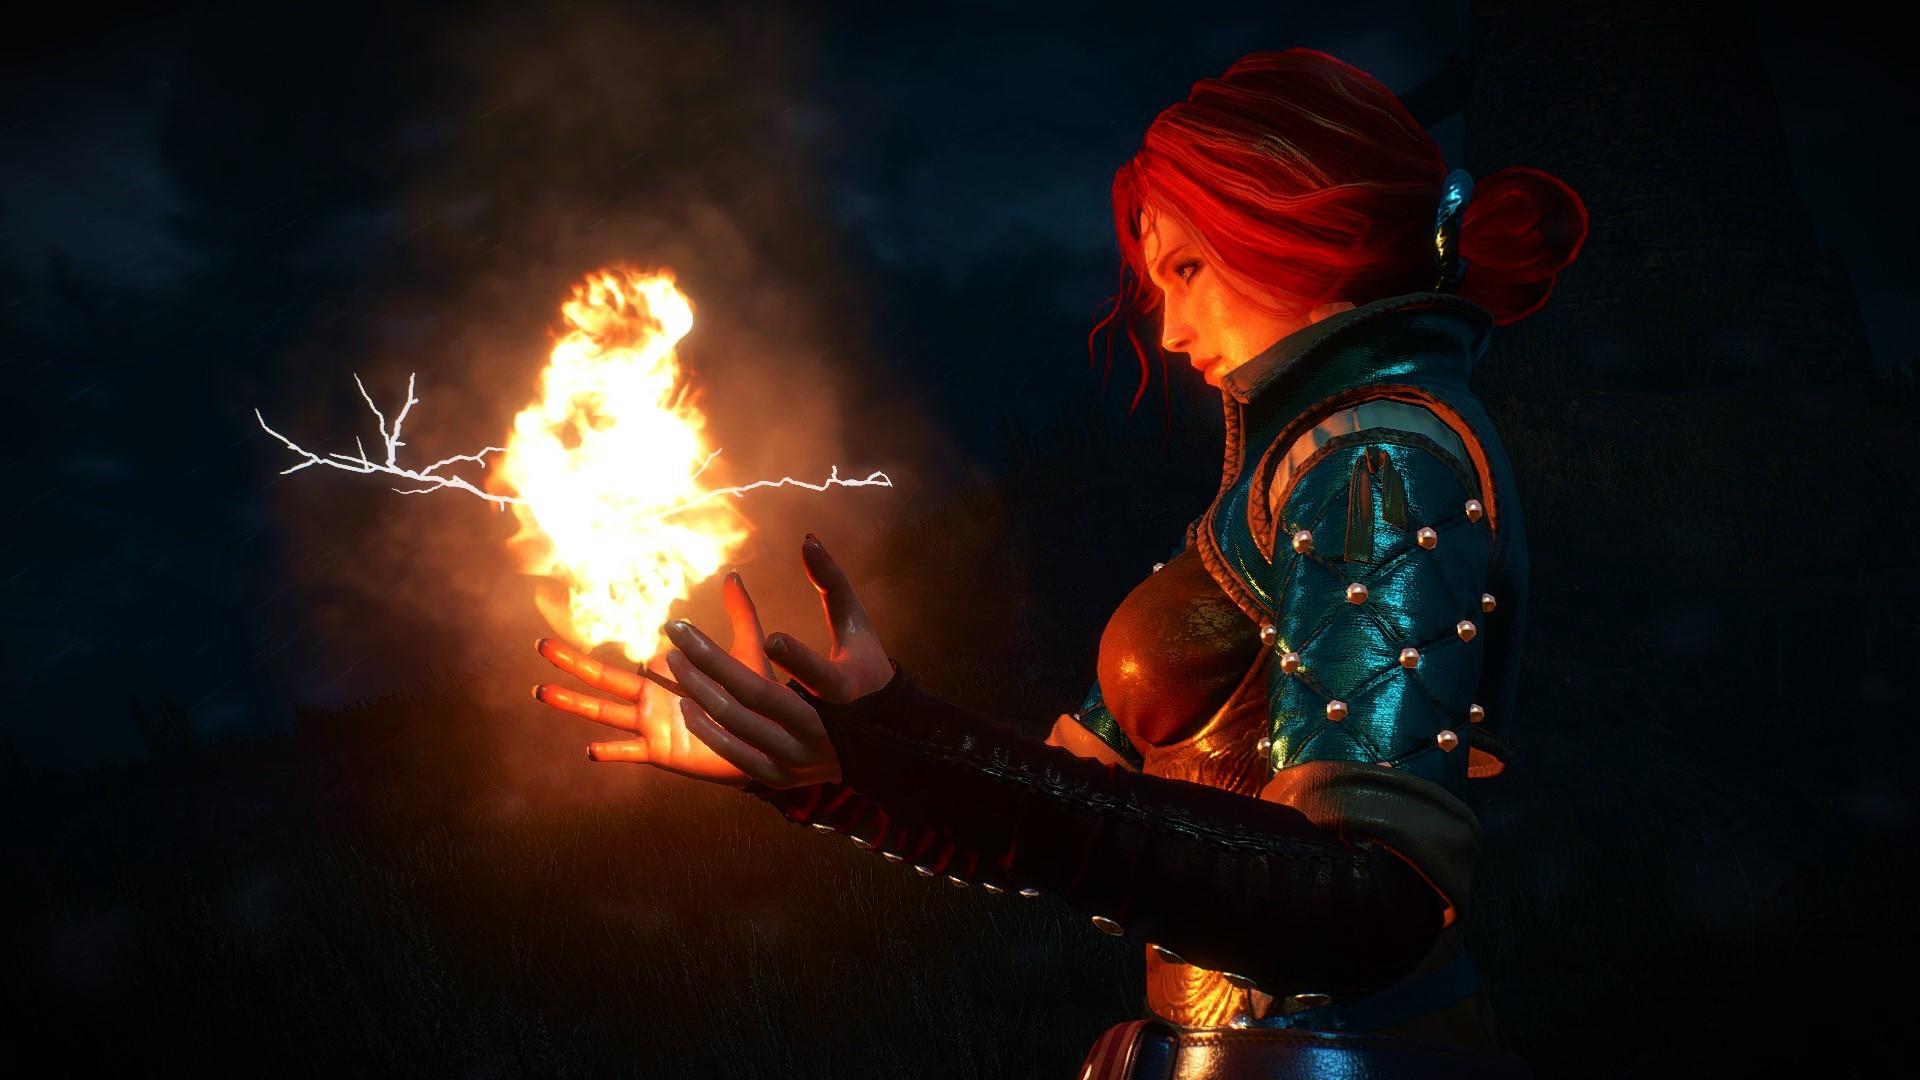 dXmAS8D.jpg - Witcher 3: Wild Hunt, the